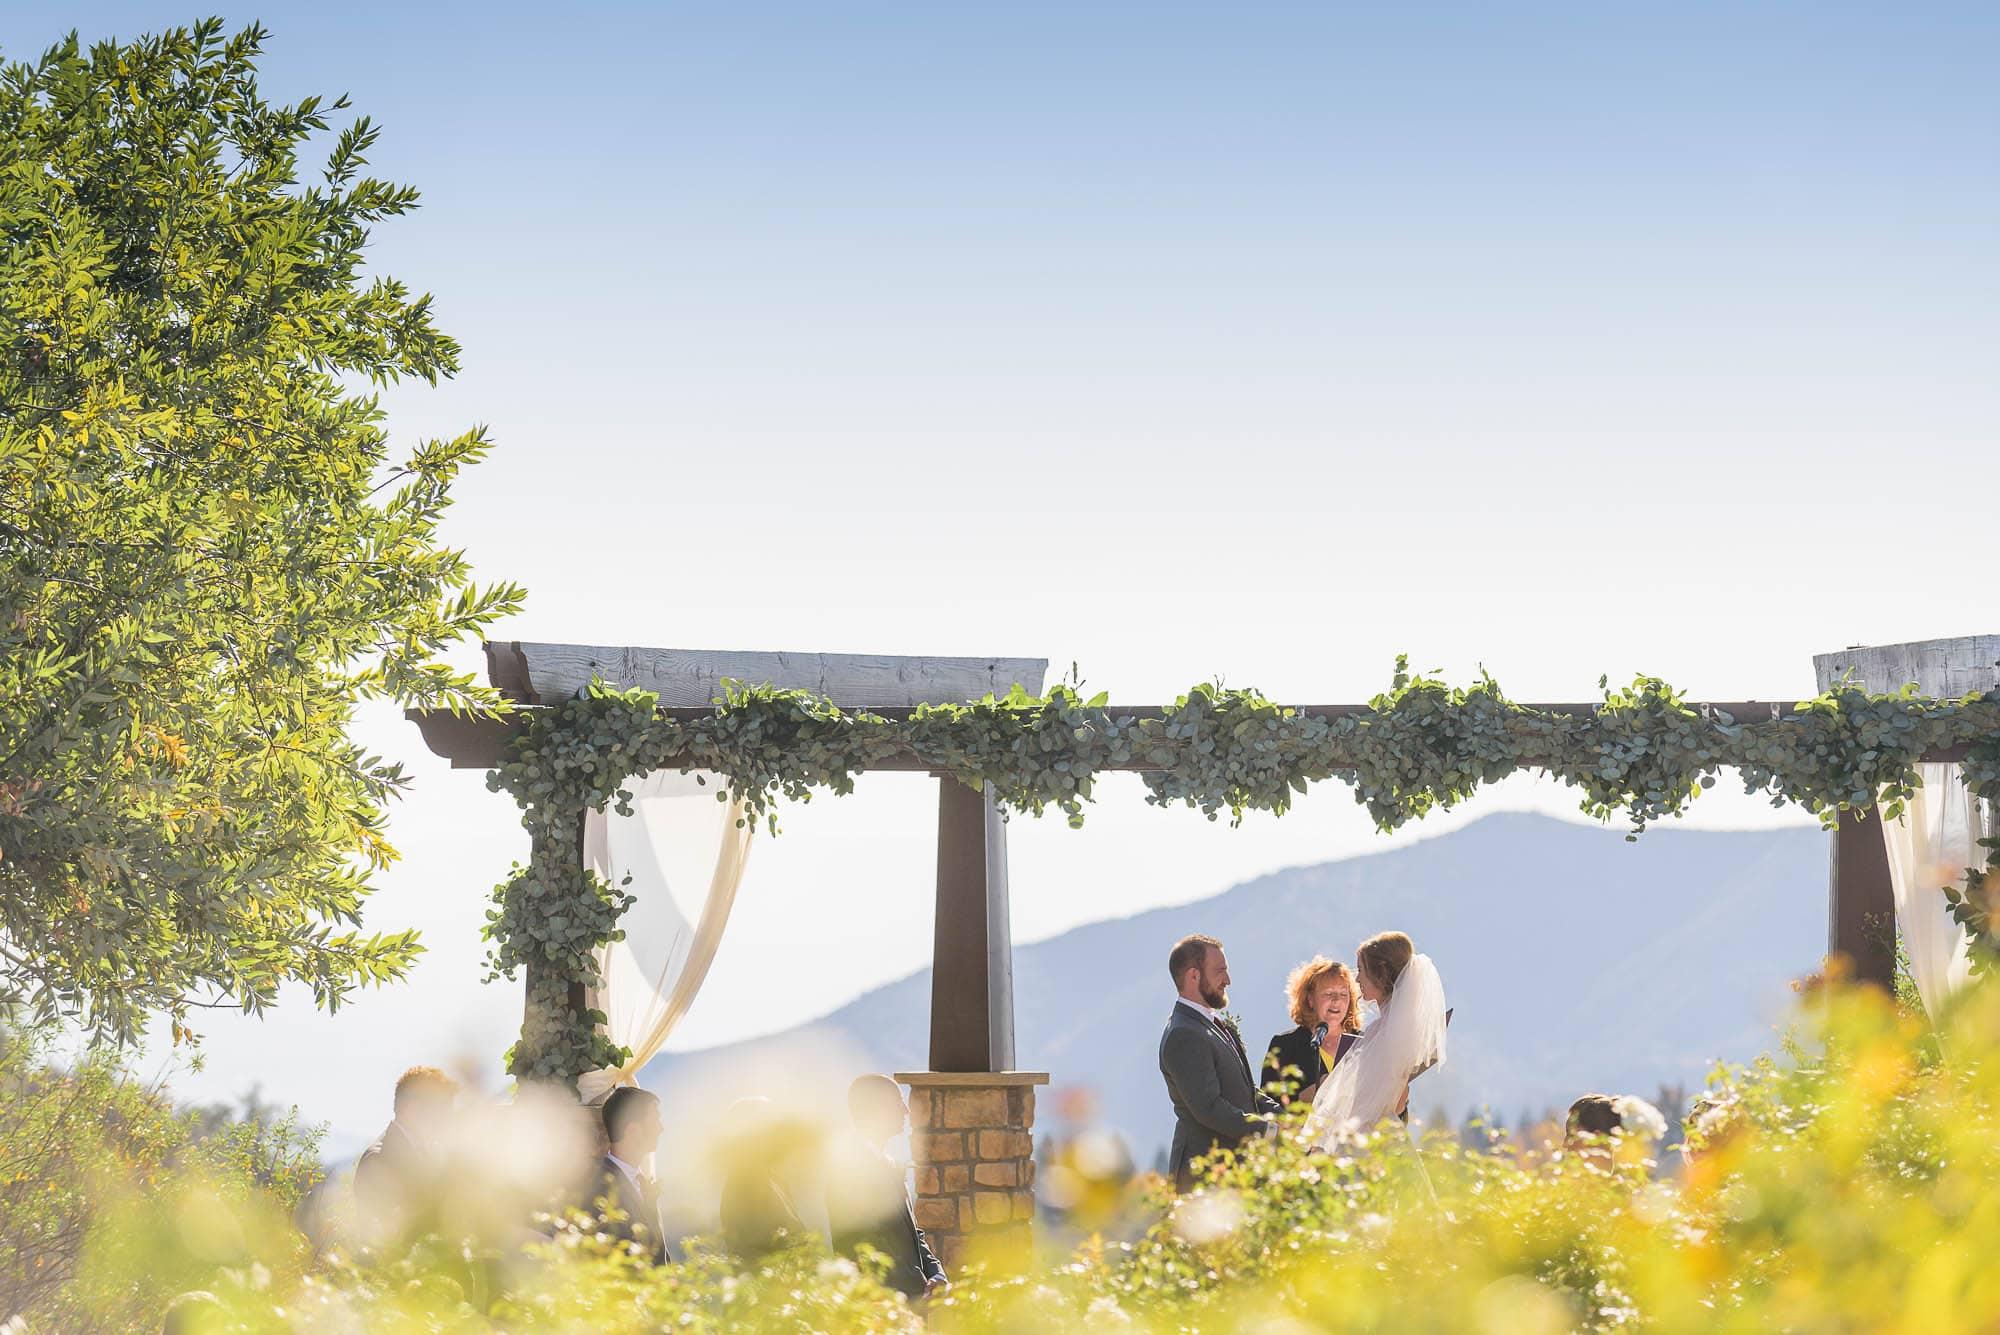 207_Alan_and_Heidi_Serendipity_Garden_Wedding_10-27-2018